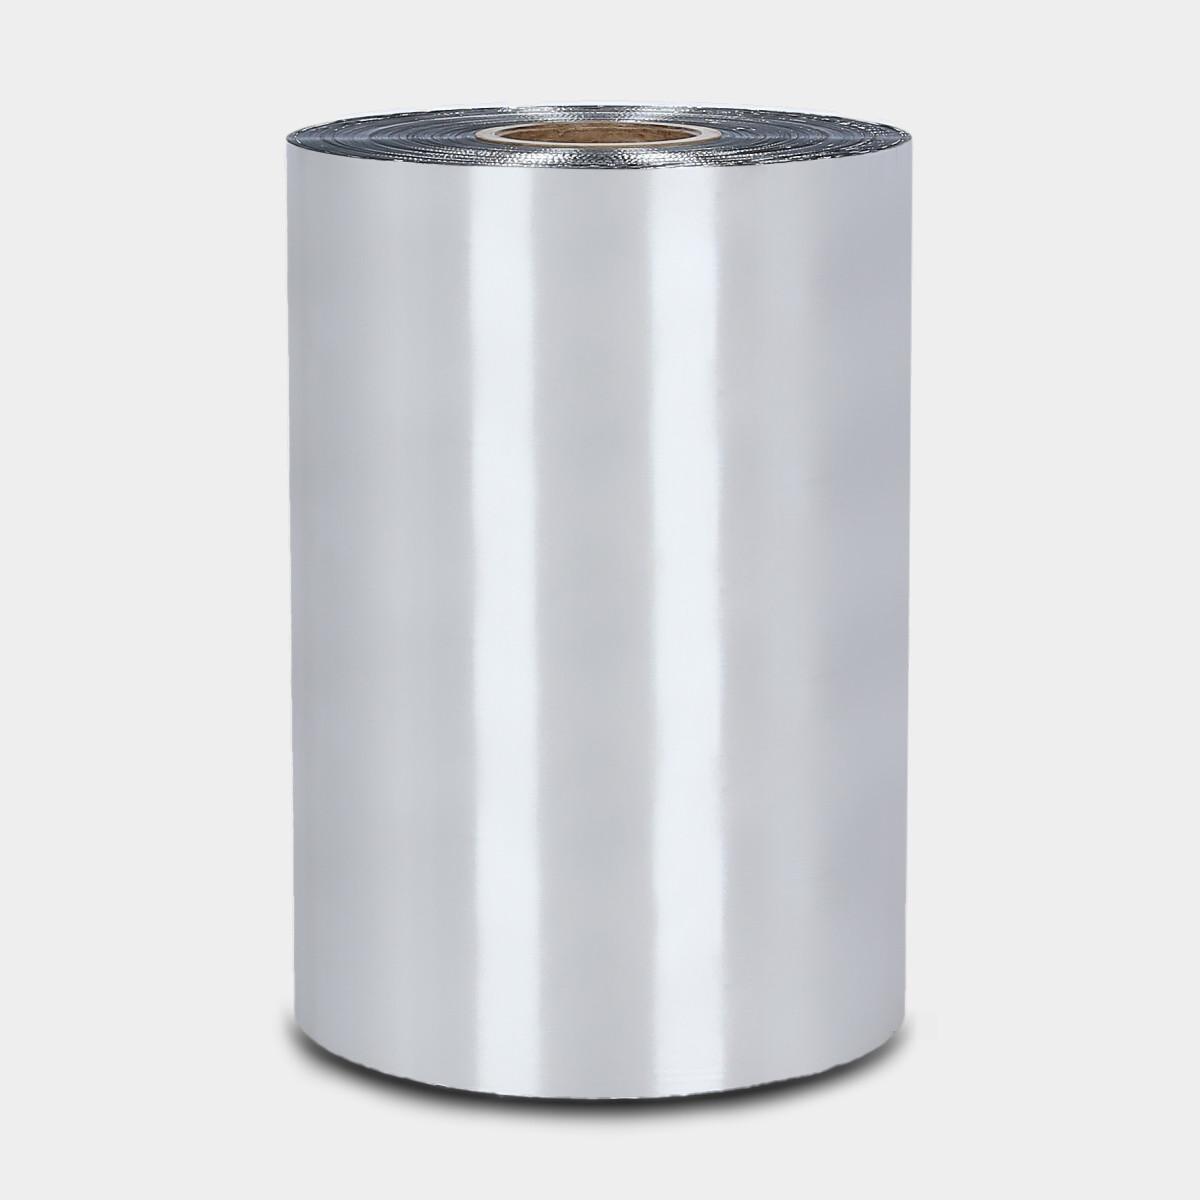 Pet termal folija silver 22my/495mm